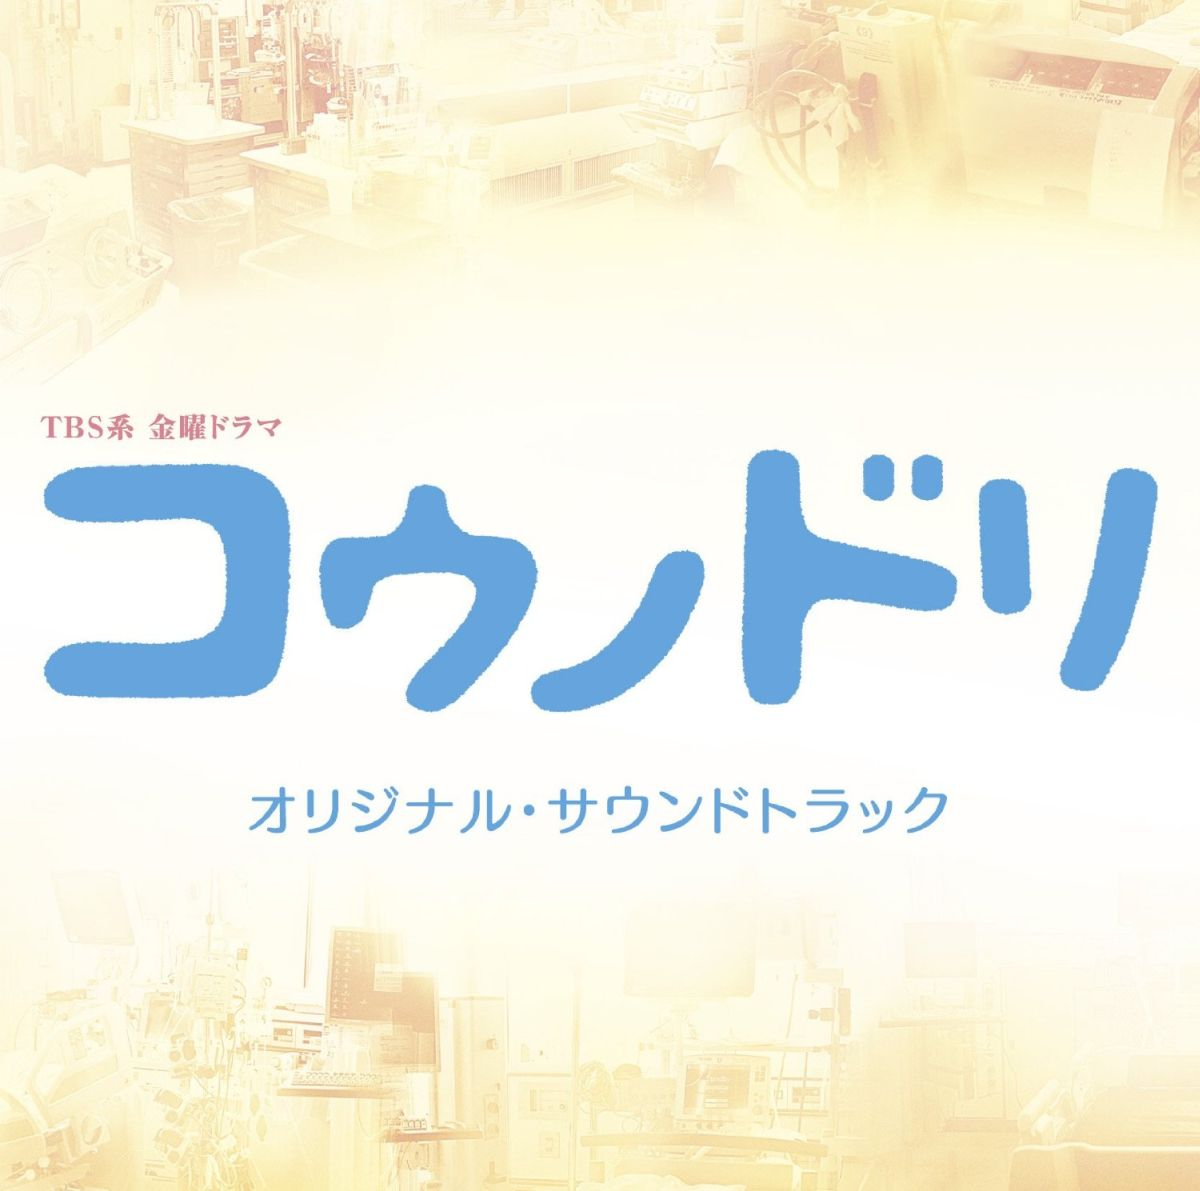 TBS系 金曜ドラマ コウノドリ オリジナル・サウンドトラック [ 清塚信也・木村秀彬 ]